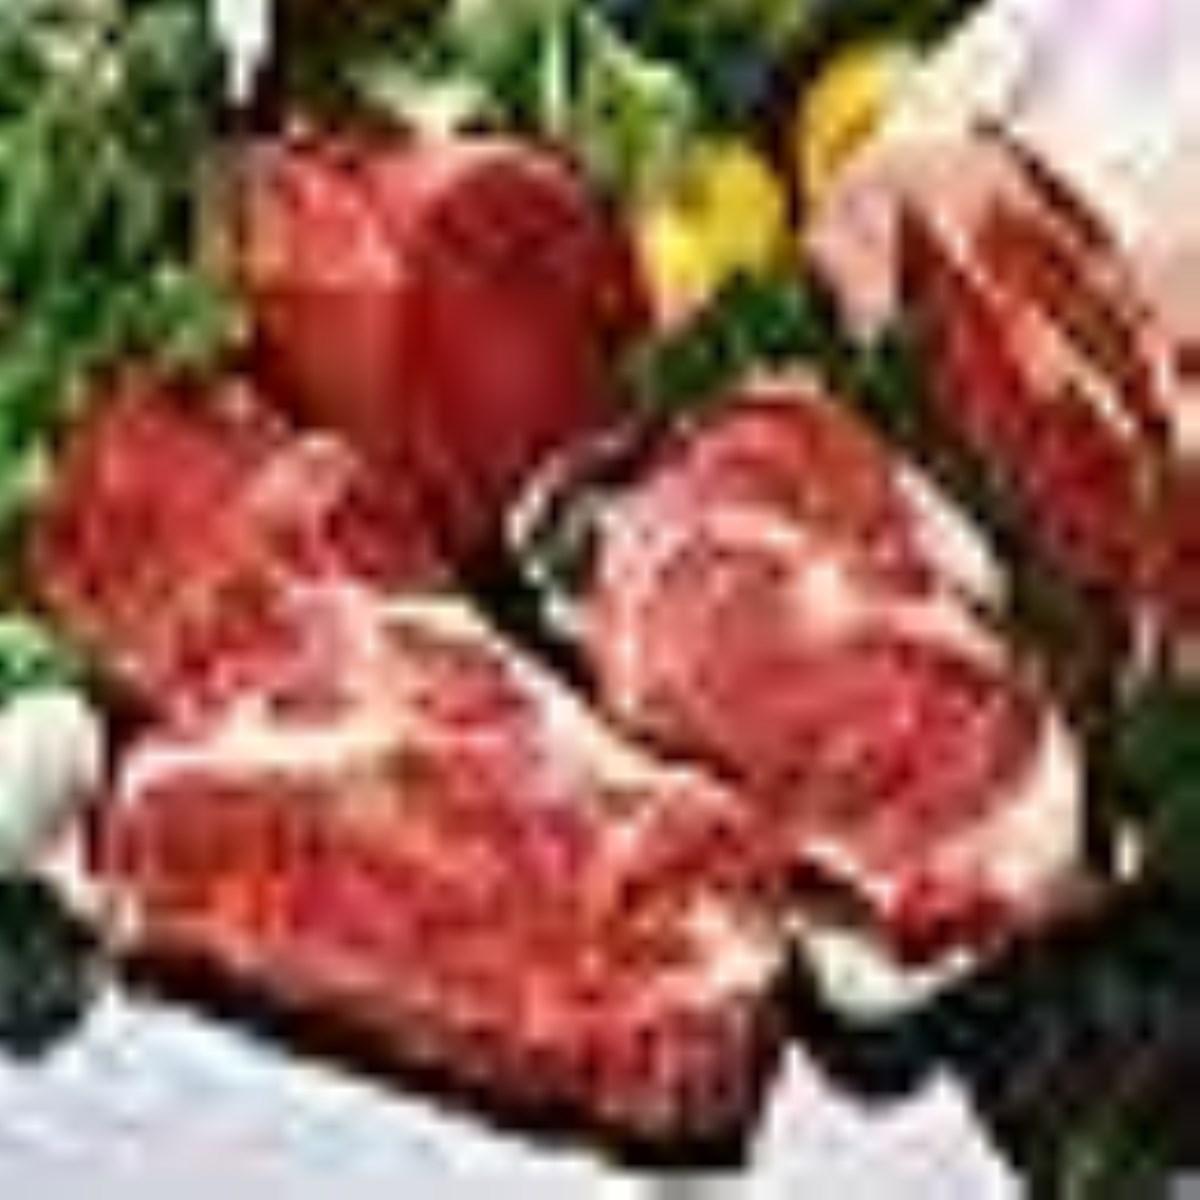 مصرف زياد گوشت قرمز ممنوع